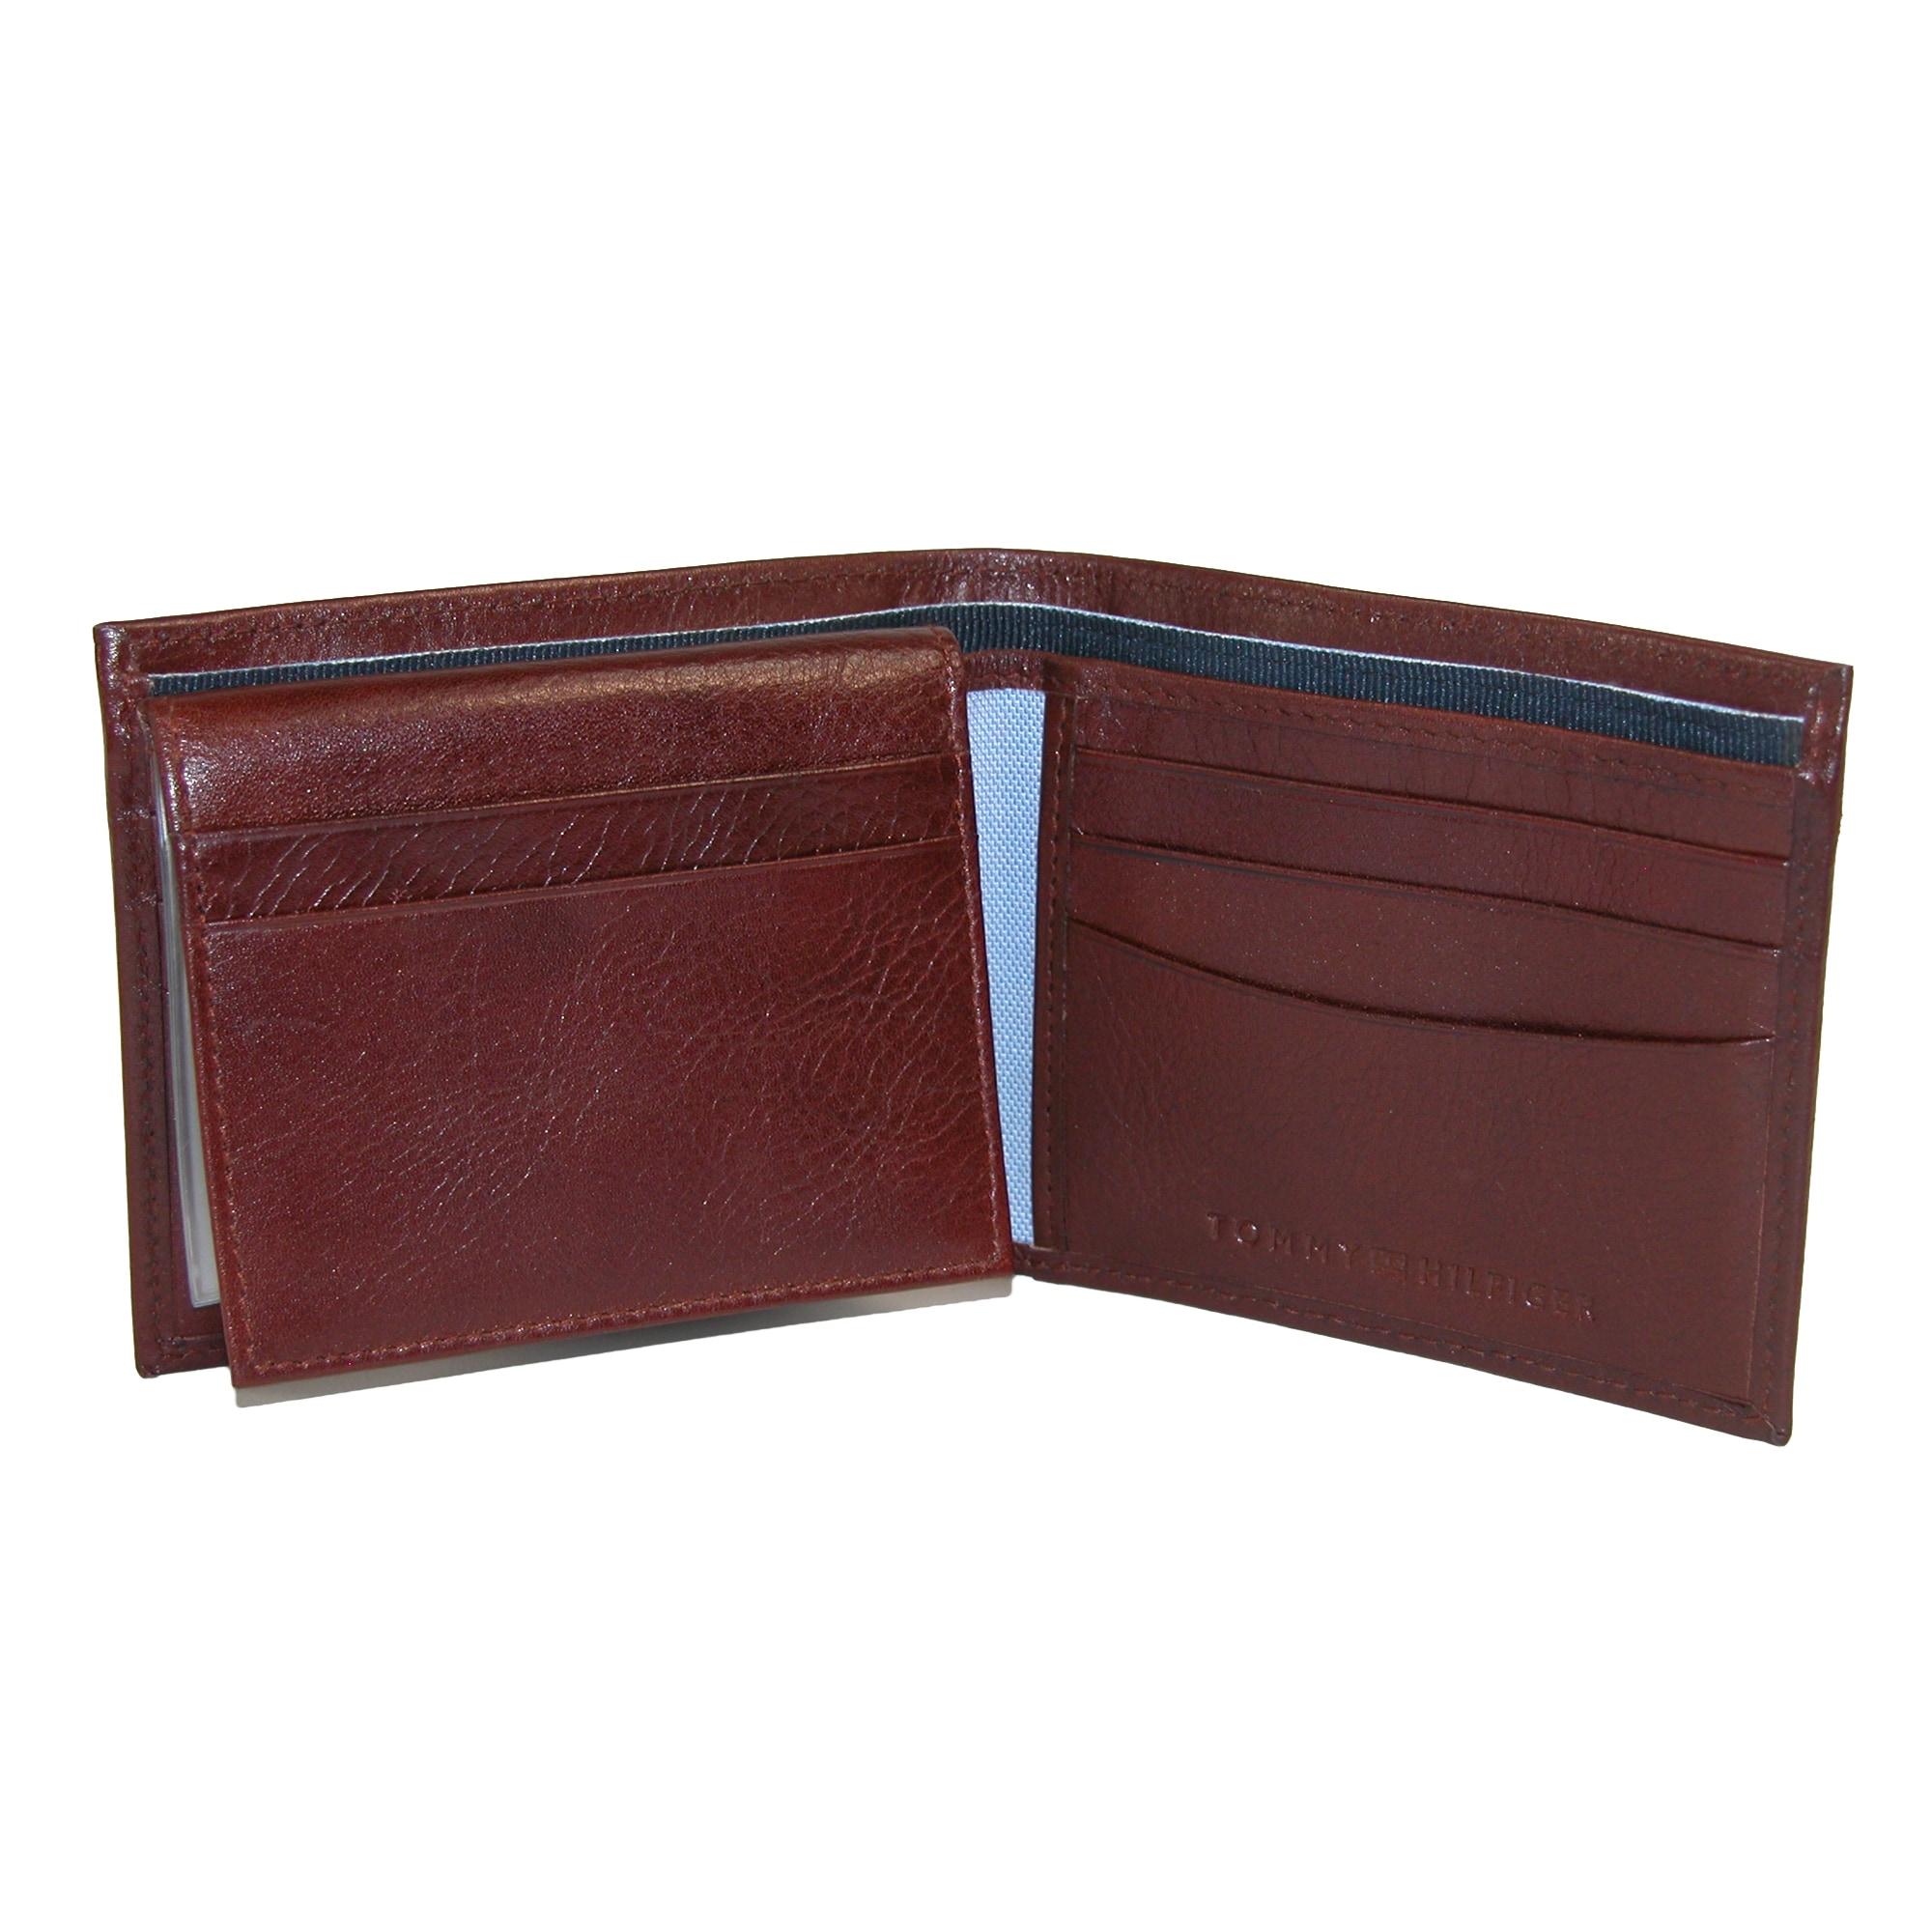 f8e33991d8c9 Tommy Hilfiger Men's Leather York Passcase Bilfold Wallet - one size